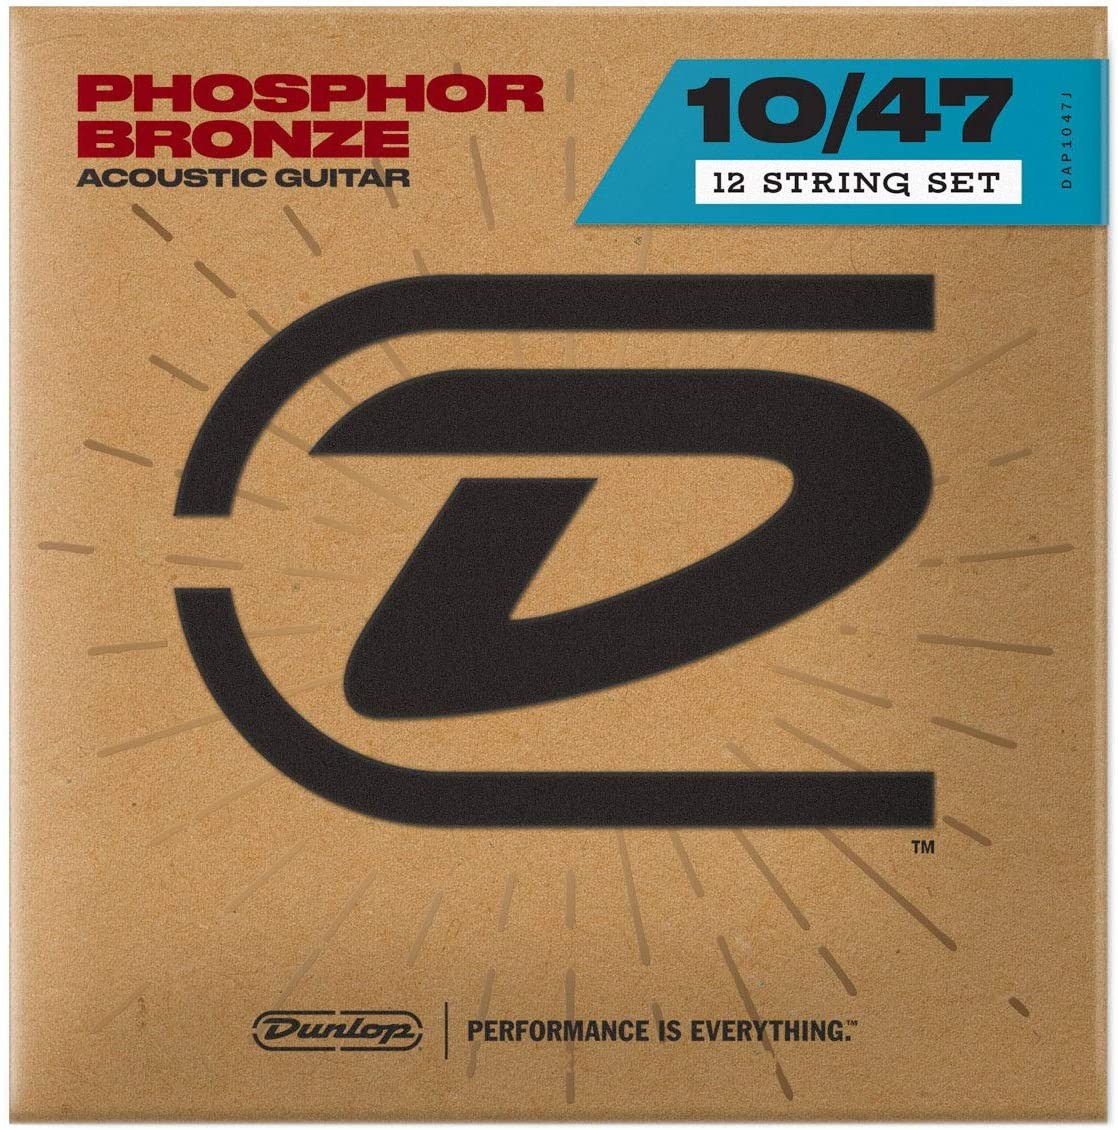 Dunlop DAP1047J Light Phosphor Bronze Acoustic Guitar Strings (0.10-0.47) 12-Strings Set